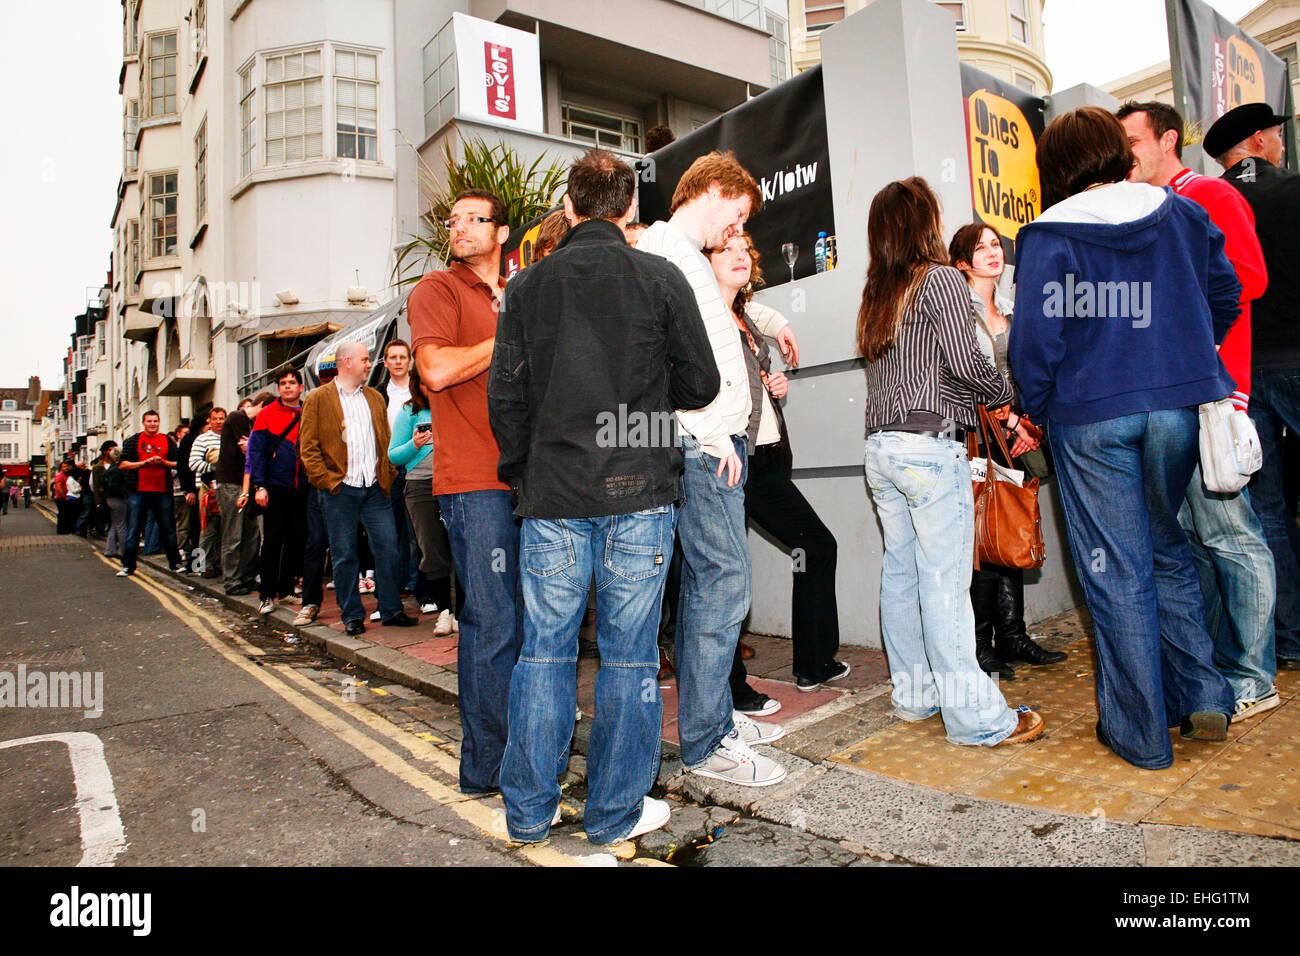 Punters queue outside Audio in Brighton. - Stock Image